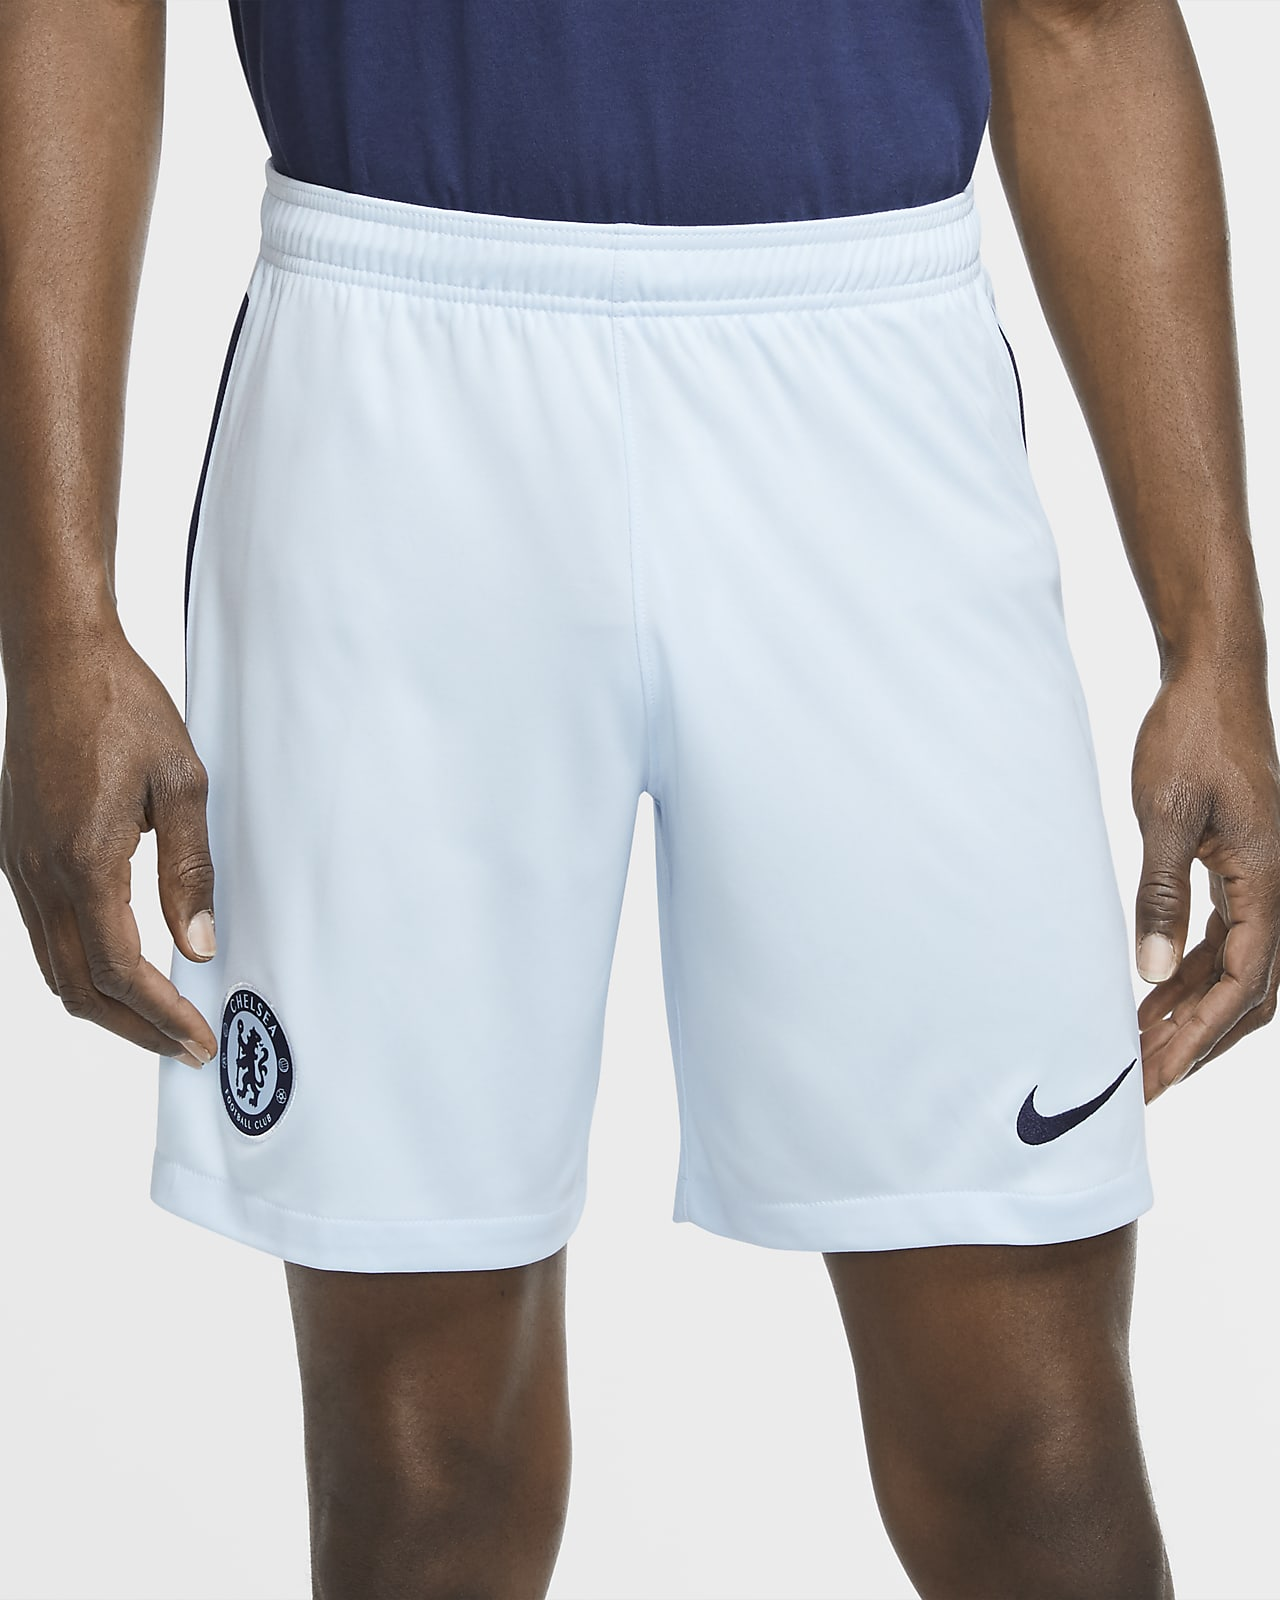 Primera/Segunda equipación Stadium Chelsea FC 2020/21 Pantalón corto de fútbol - Hombre